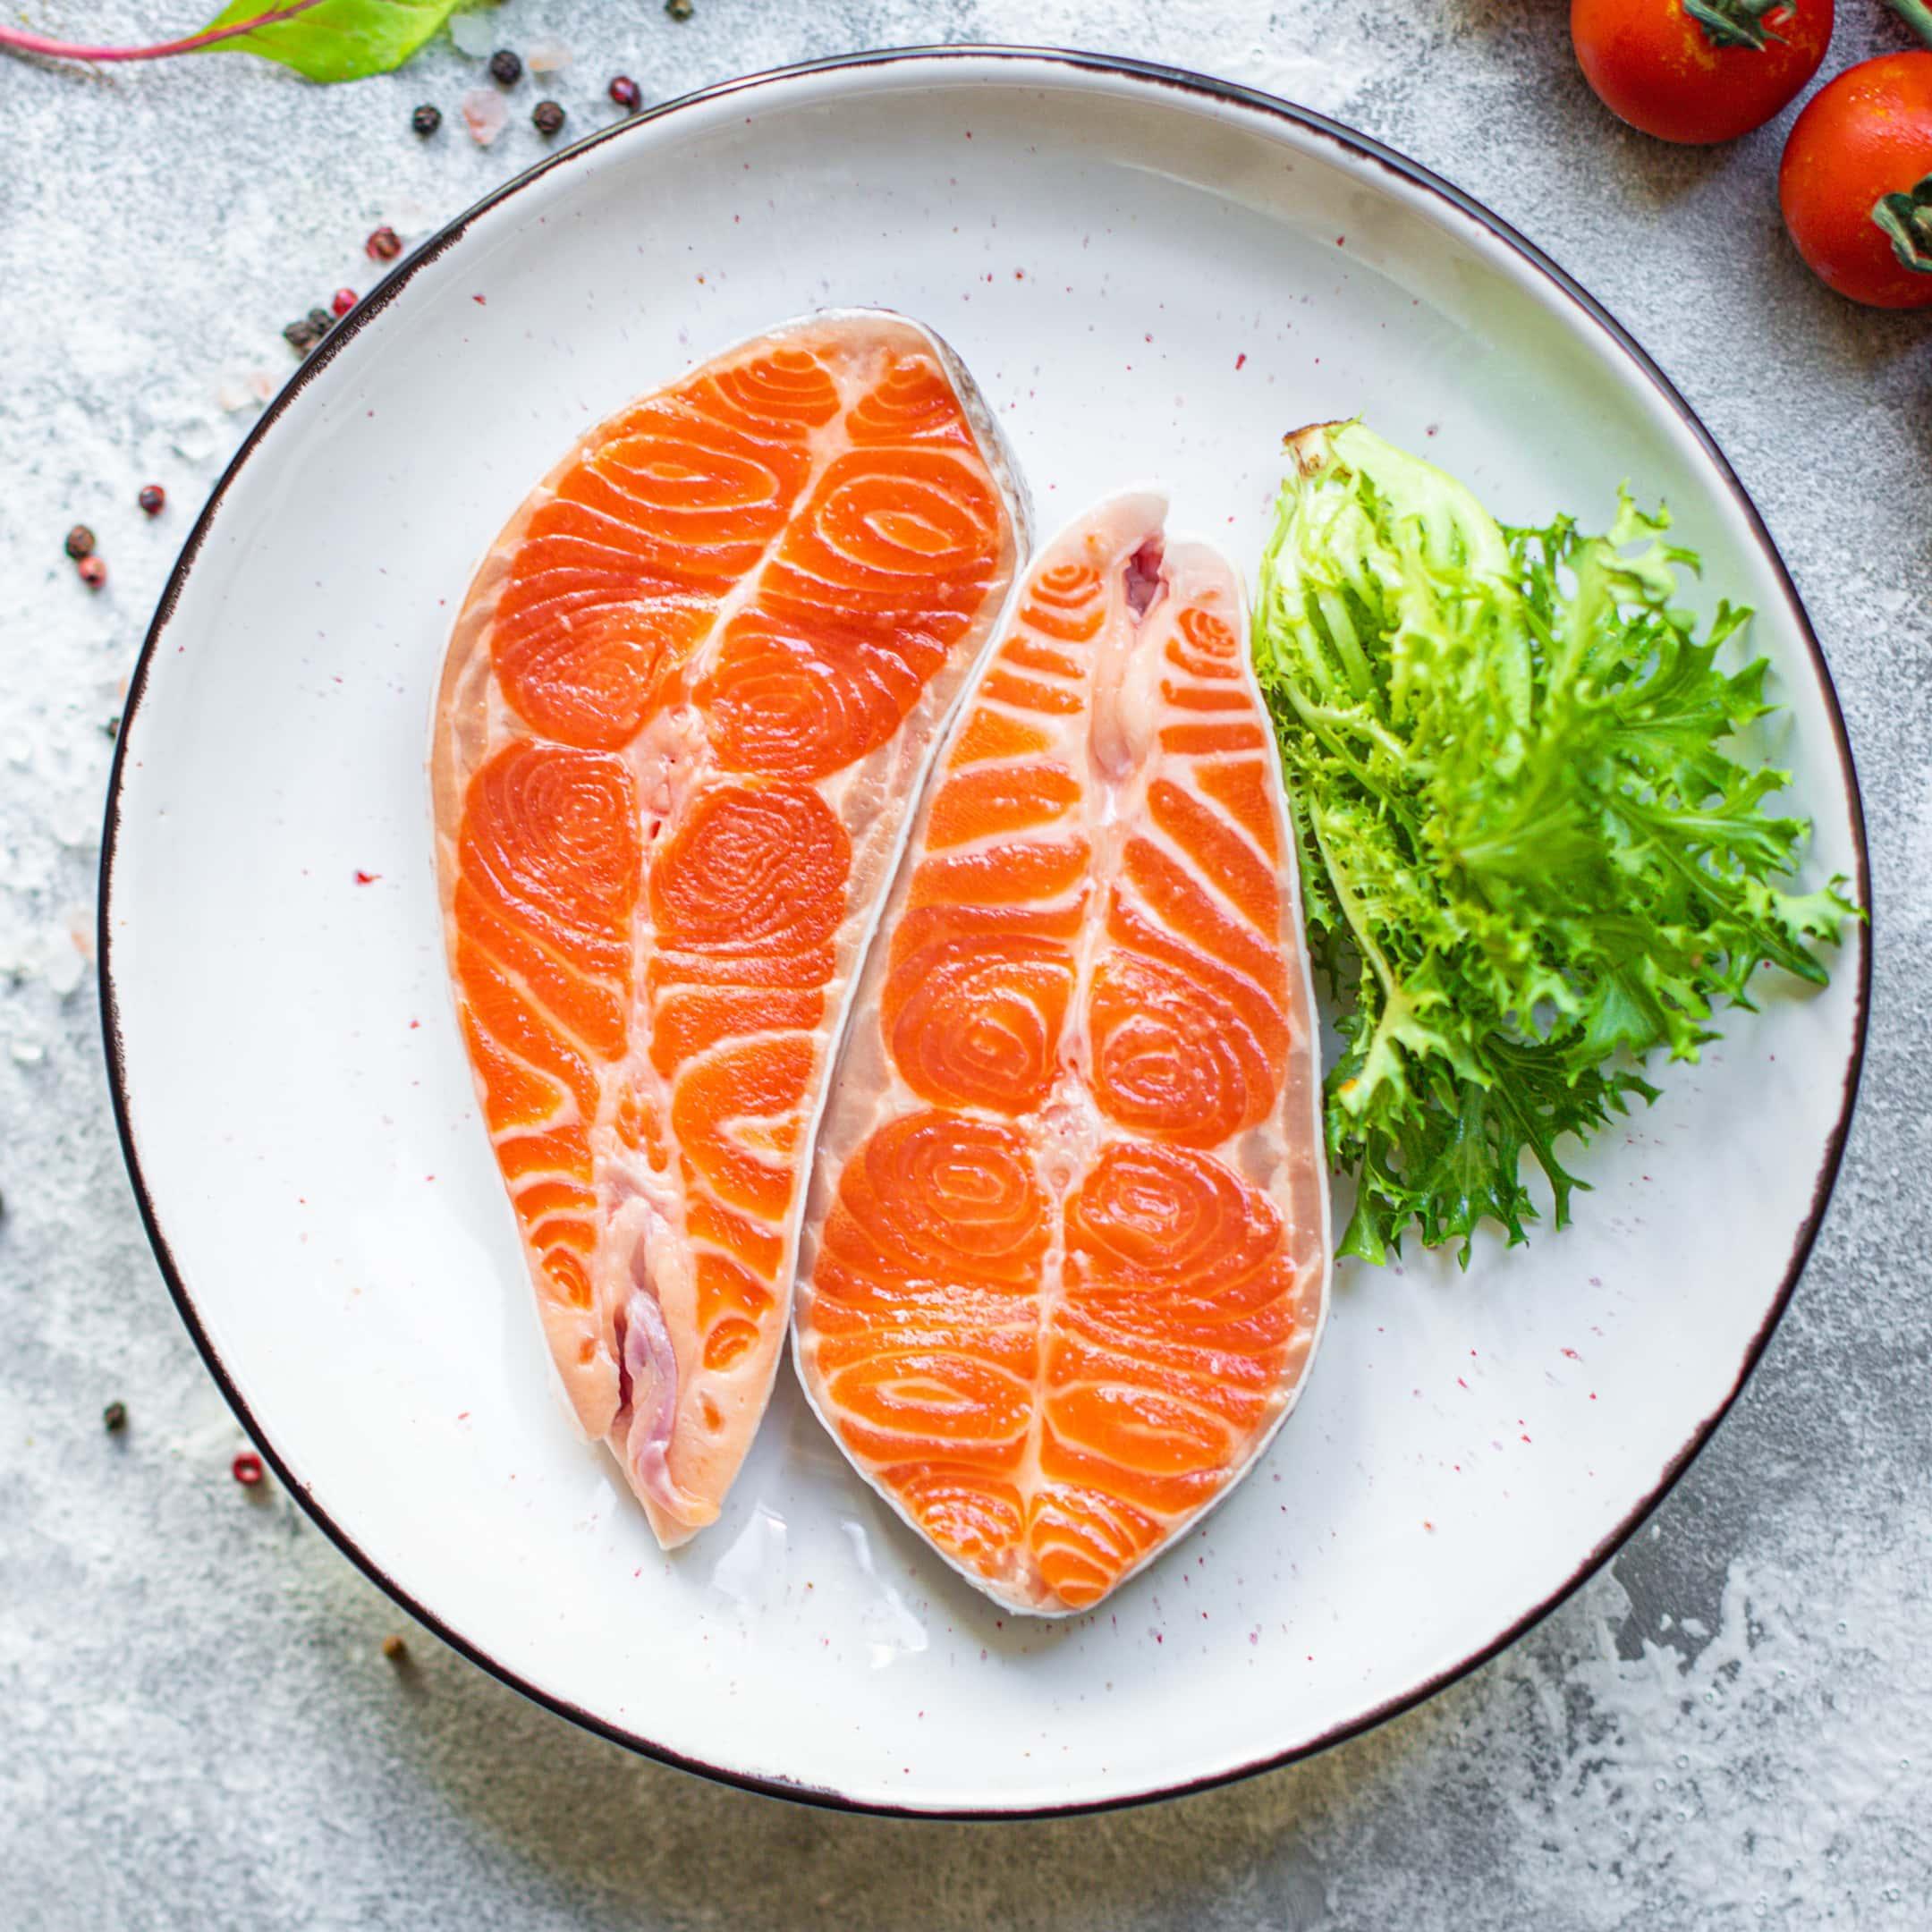 Salmon fish raw steak fillet on ceramic plate